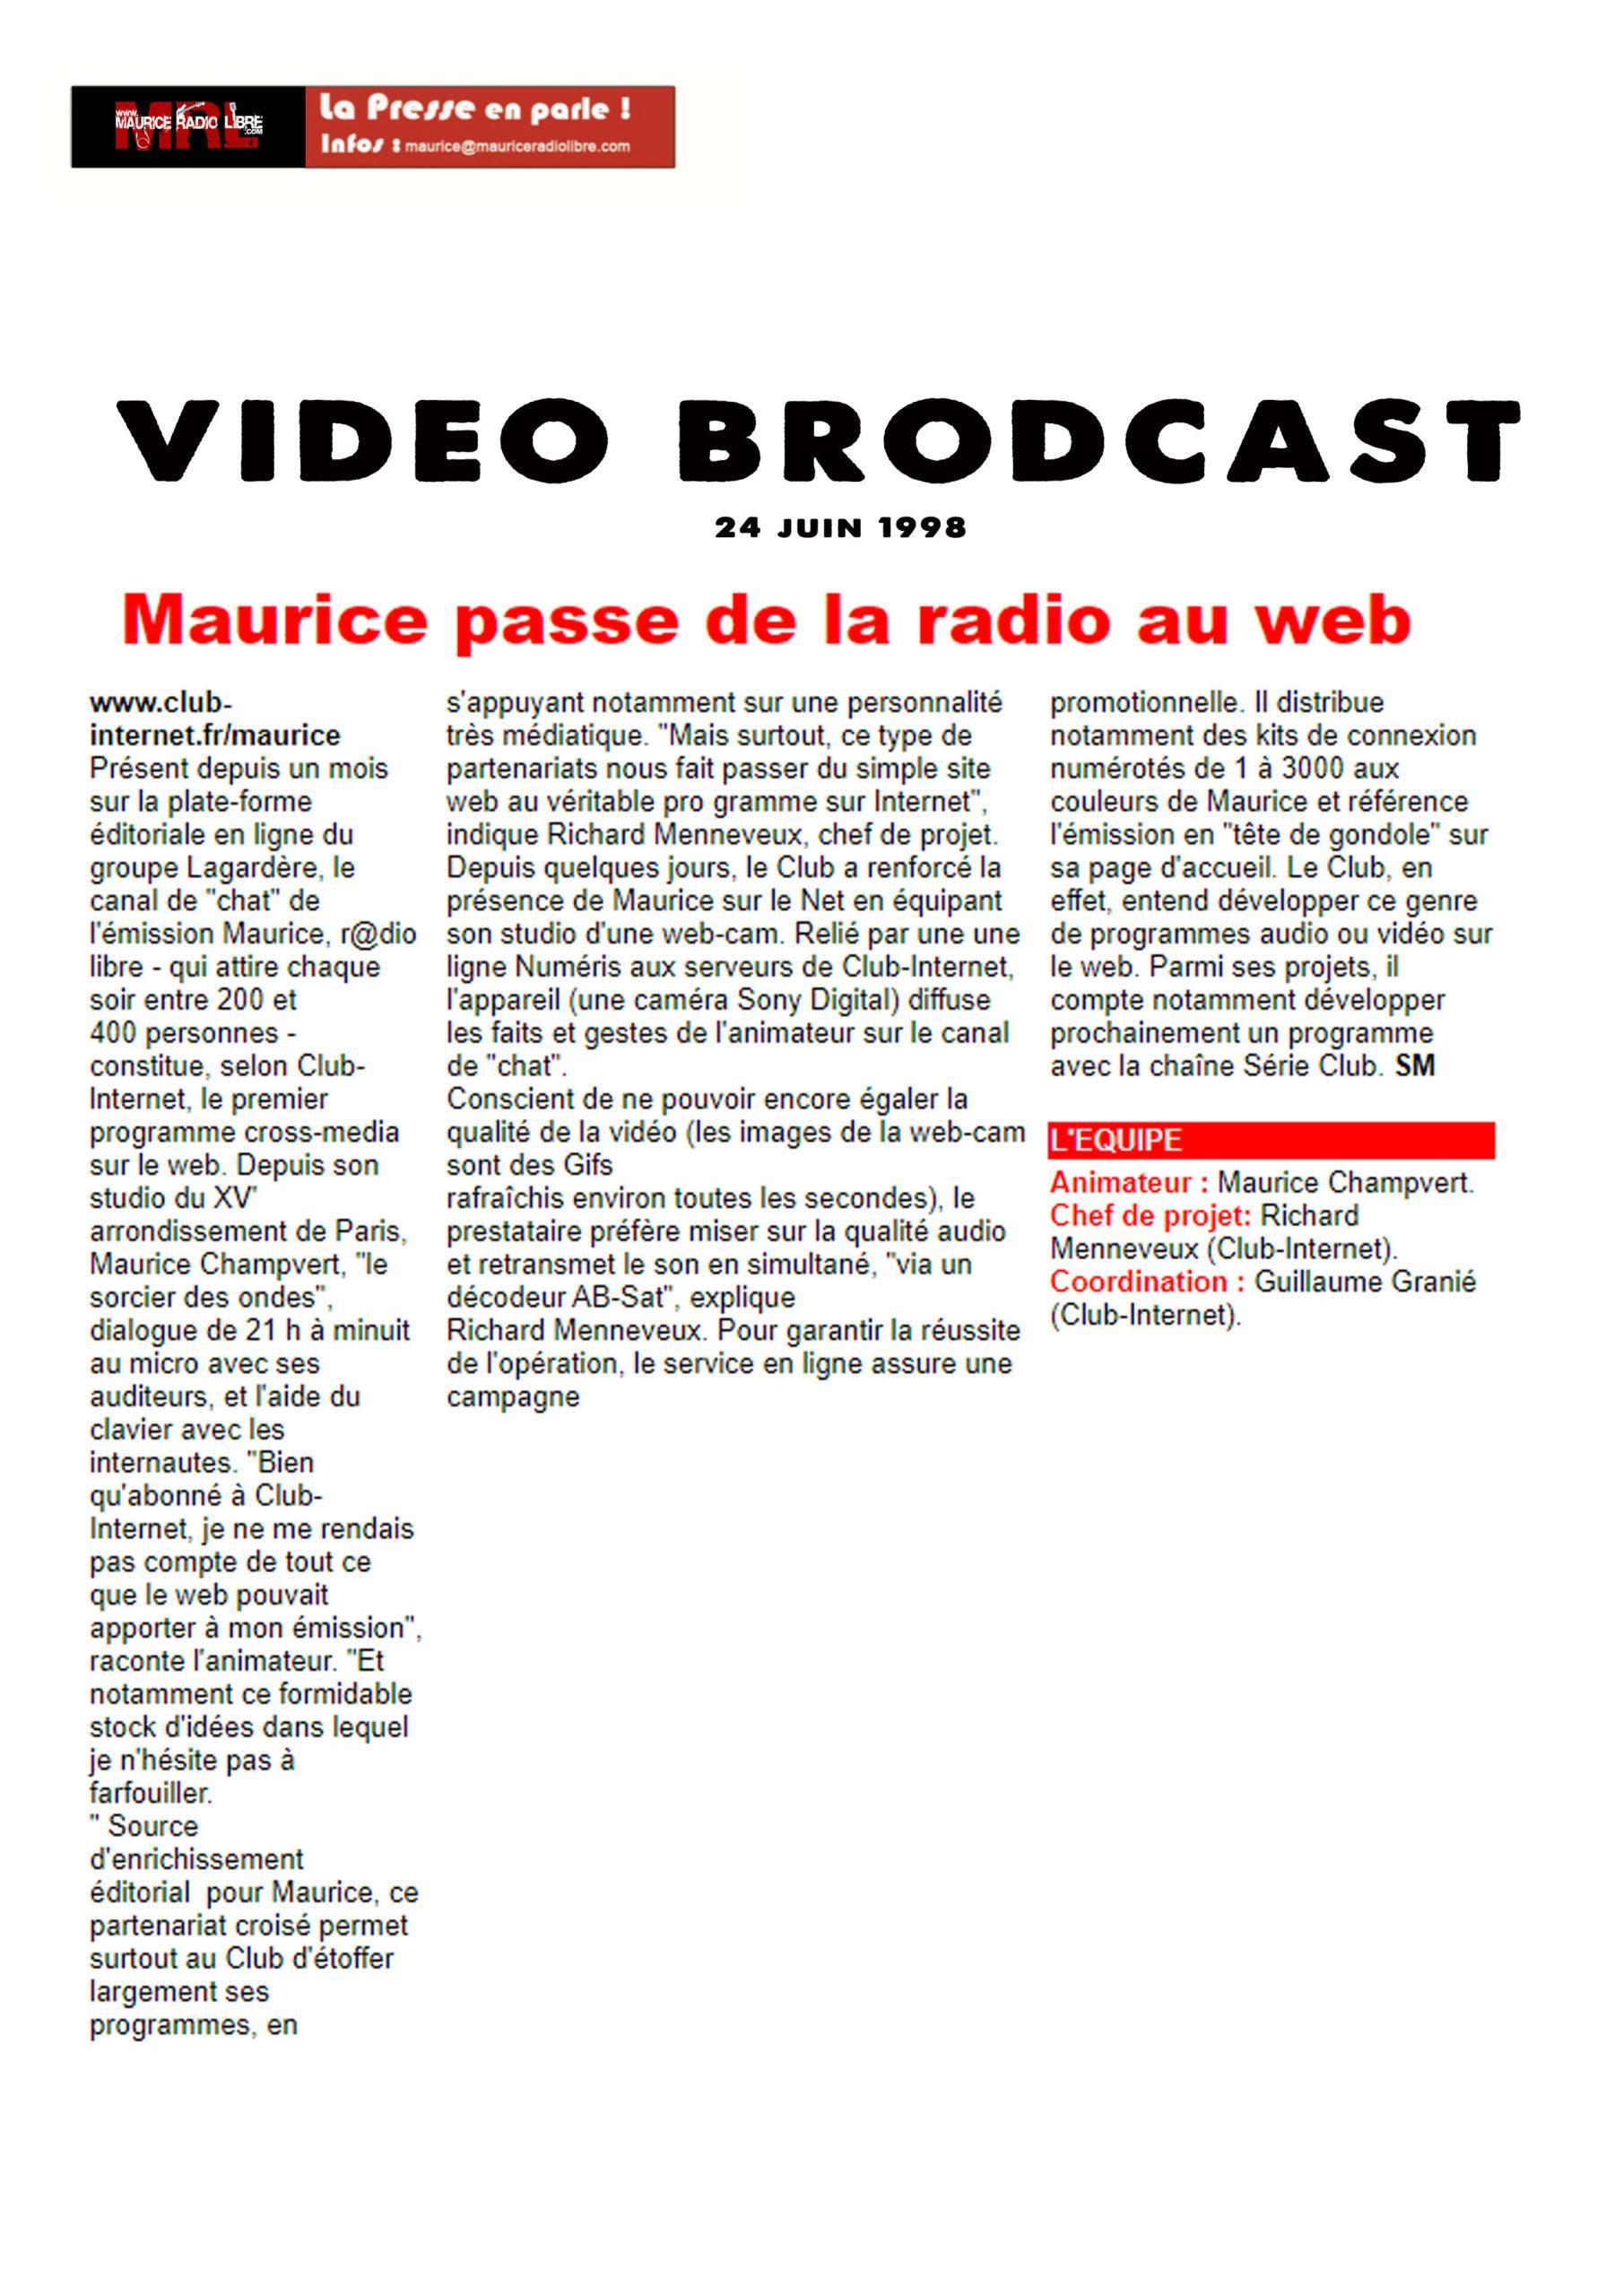 vignette Video Broadcast Maurice passe de la radio au web 24/06/1998